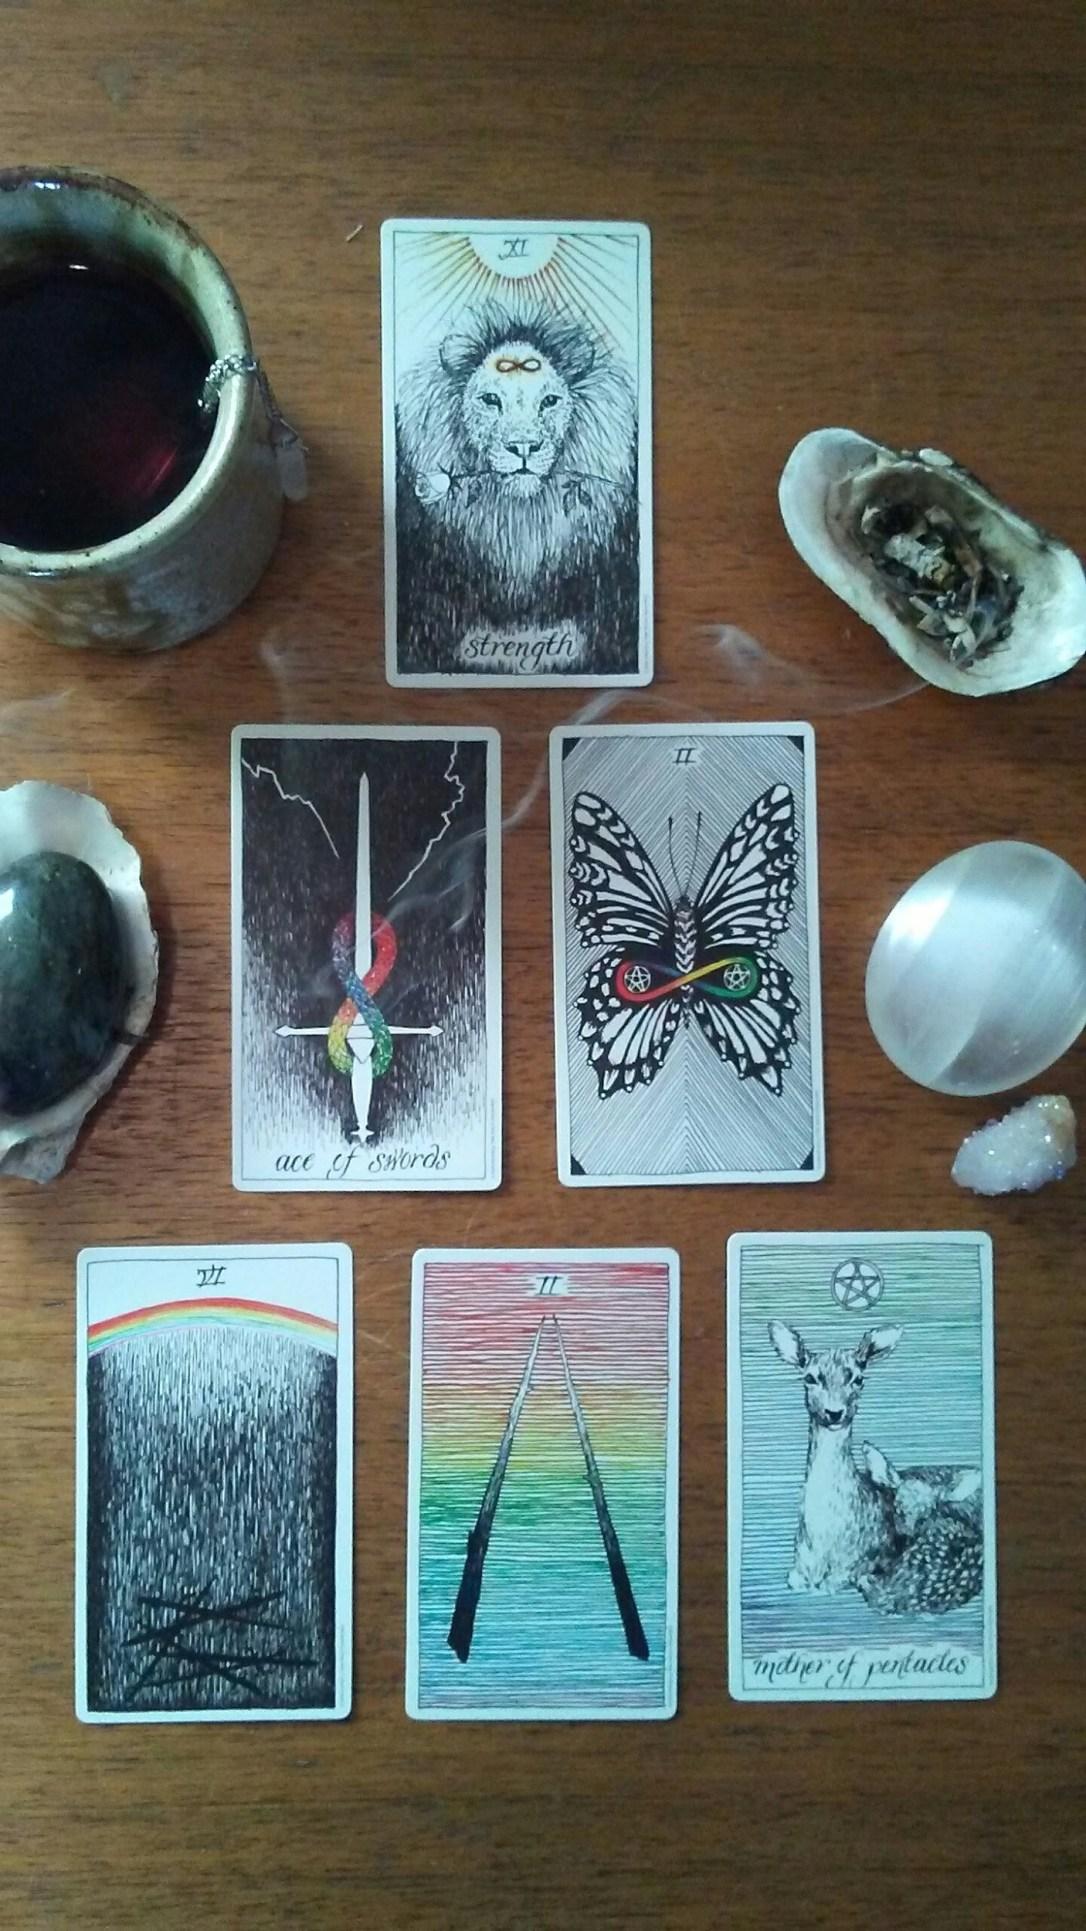 Tarot cards, incense, tea, crystals, shells